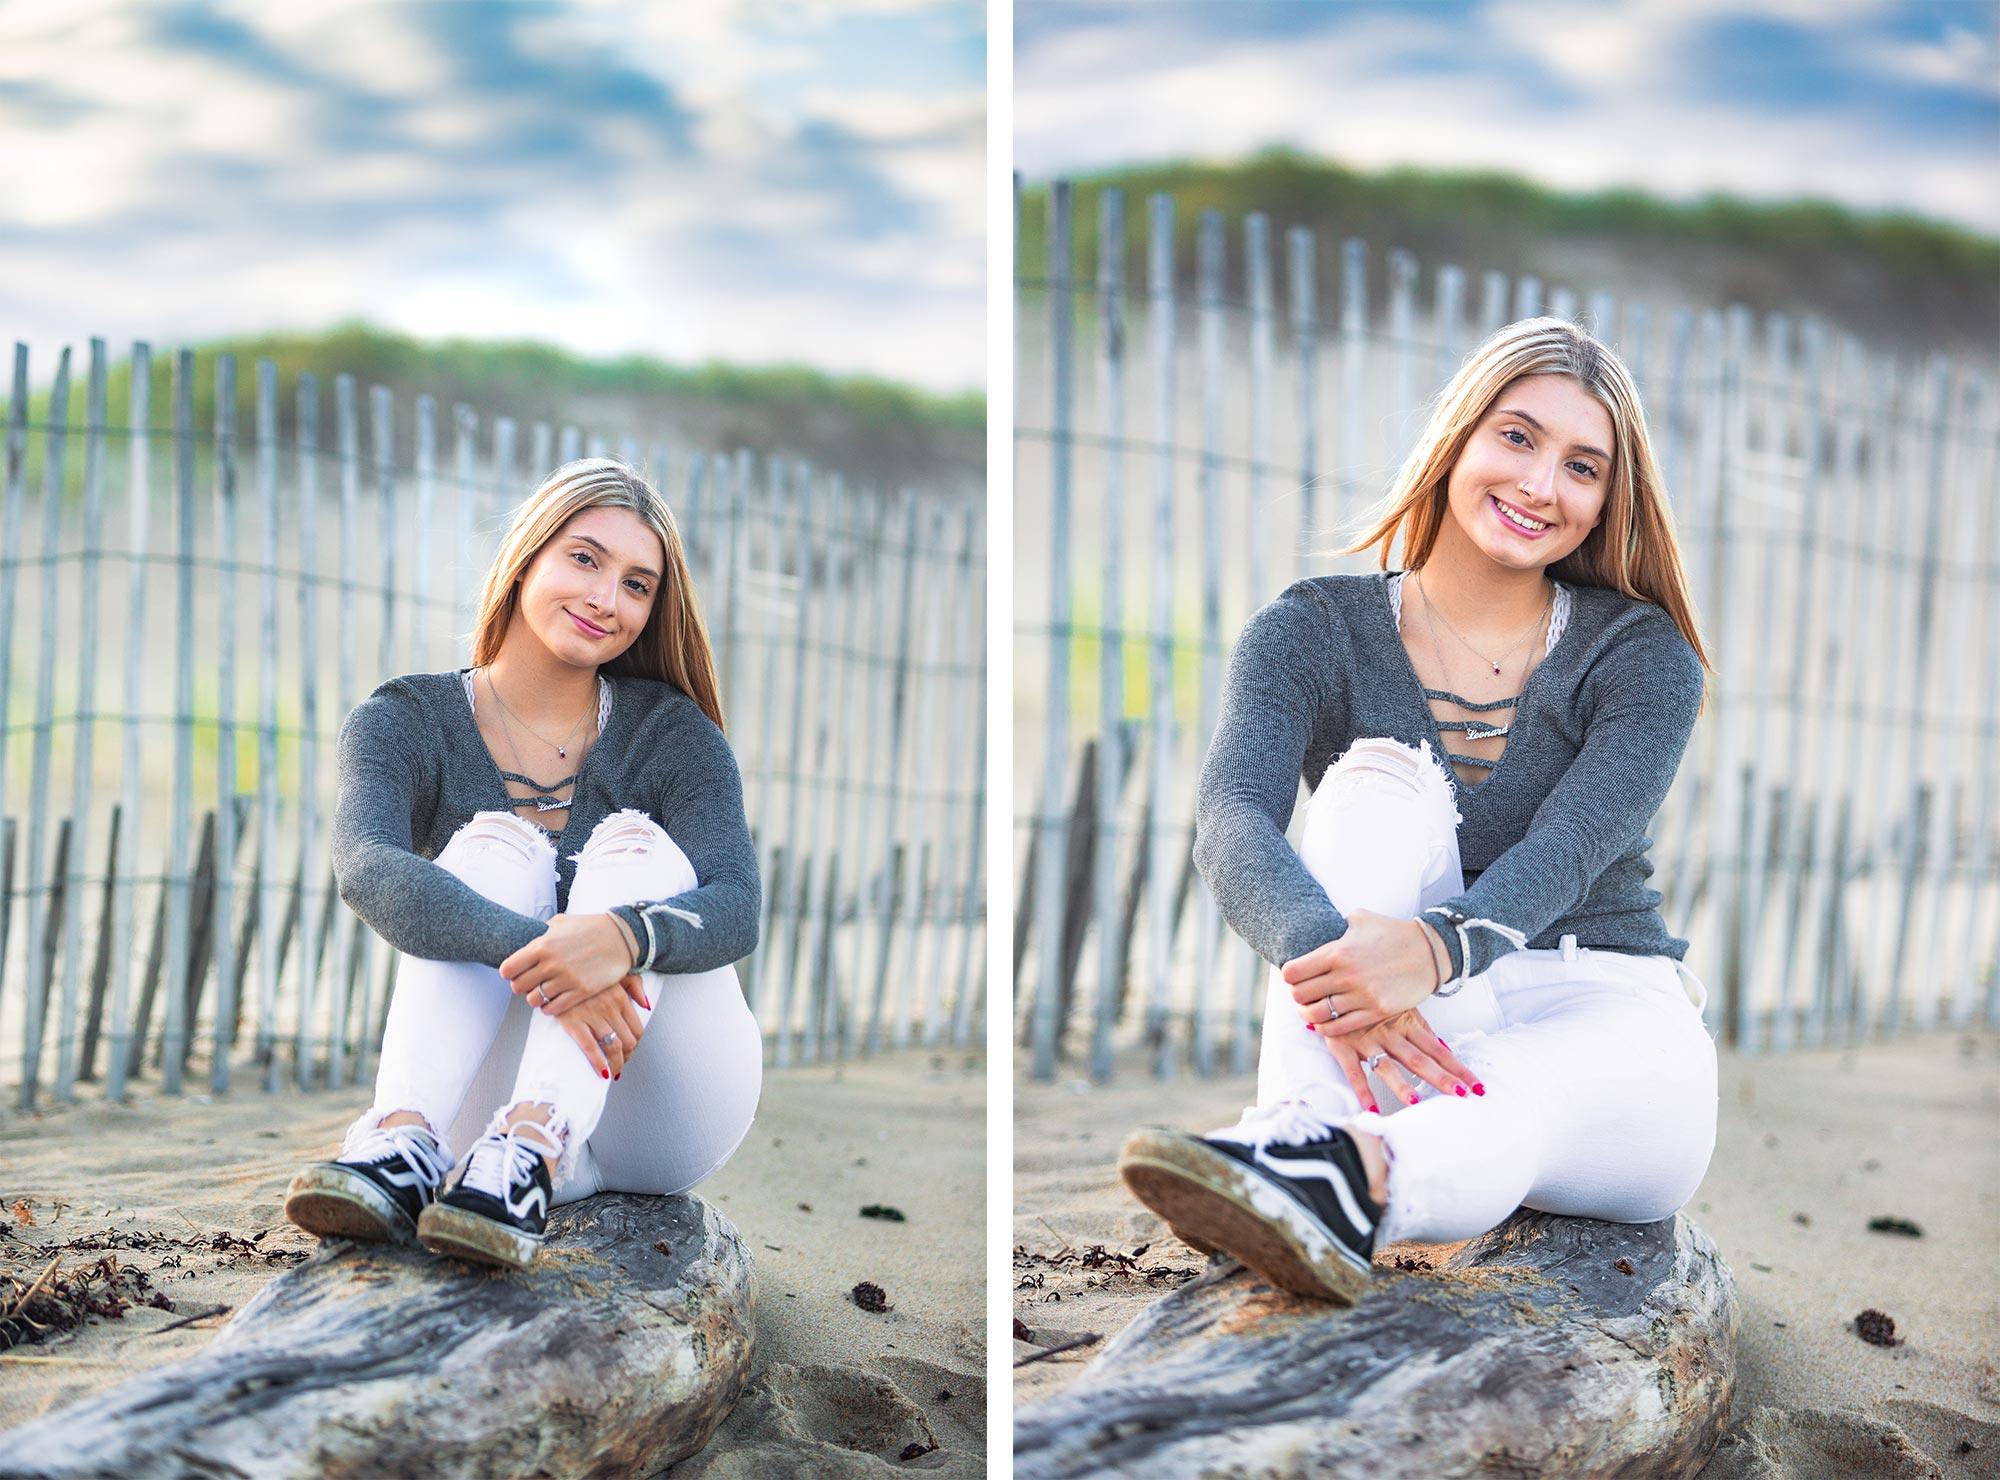 Plum Island Beach Senior Portraits | Stephen Grant Photography